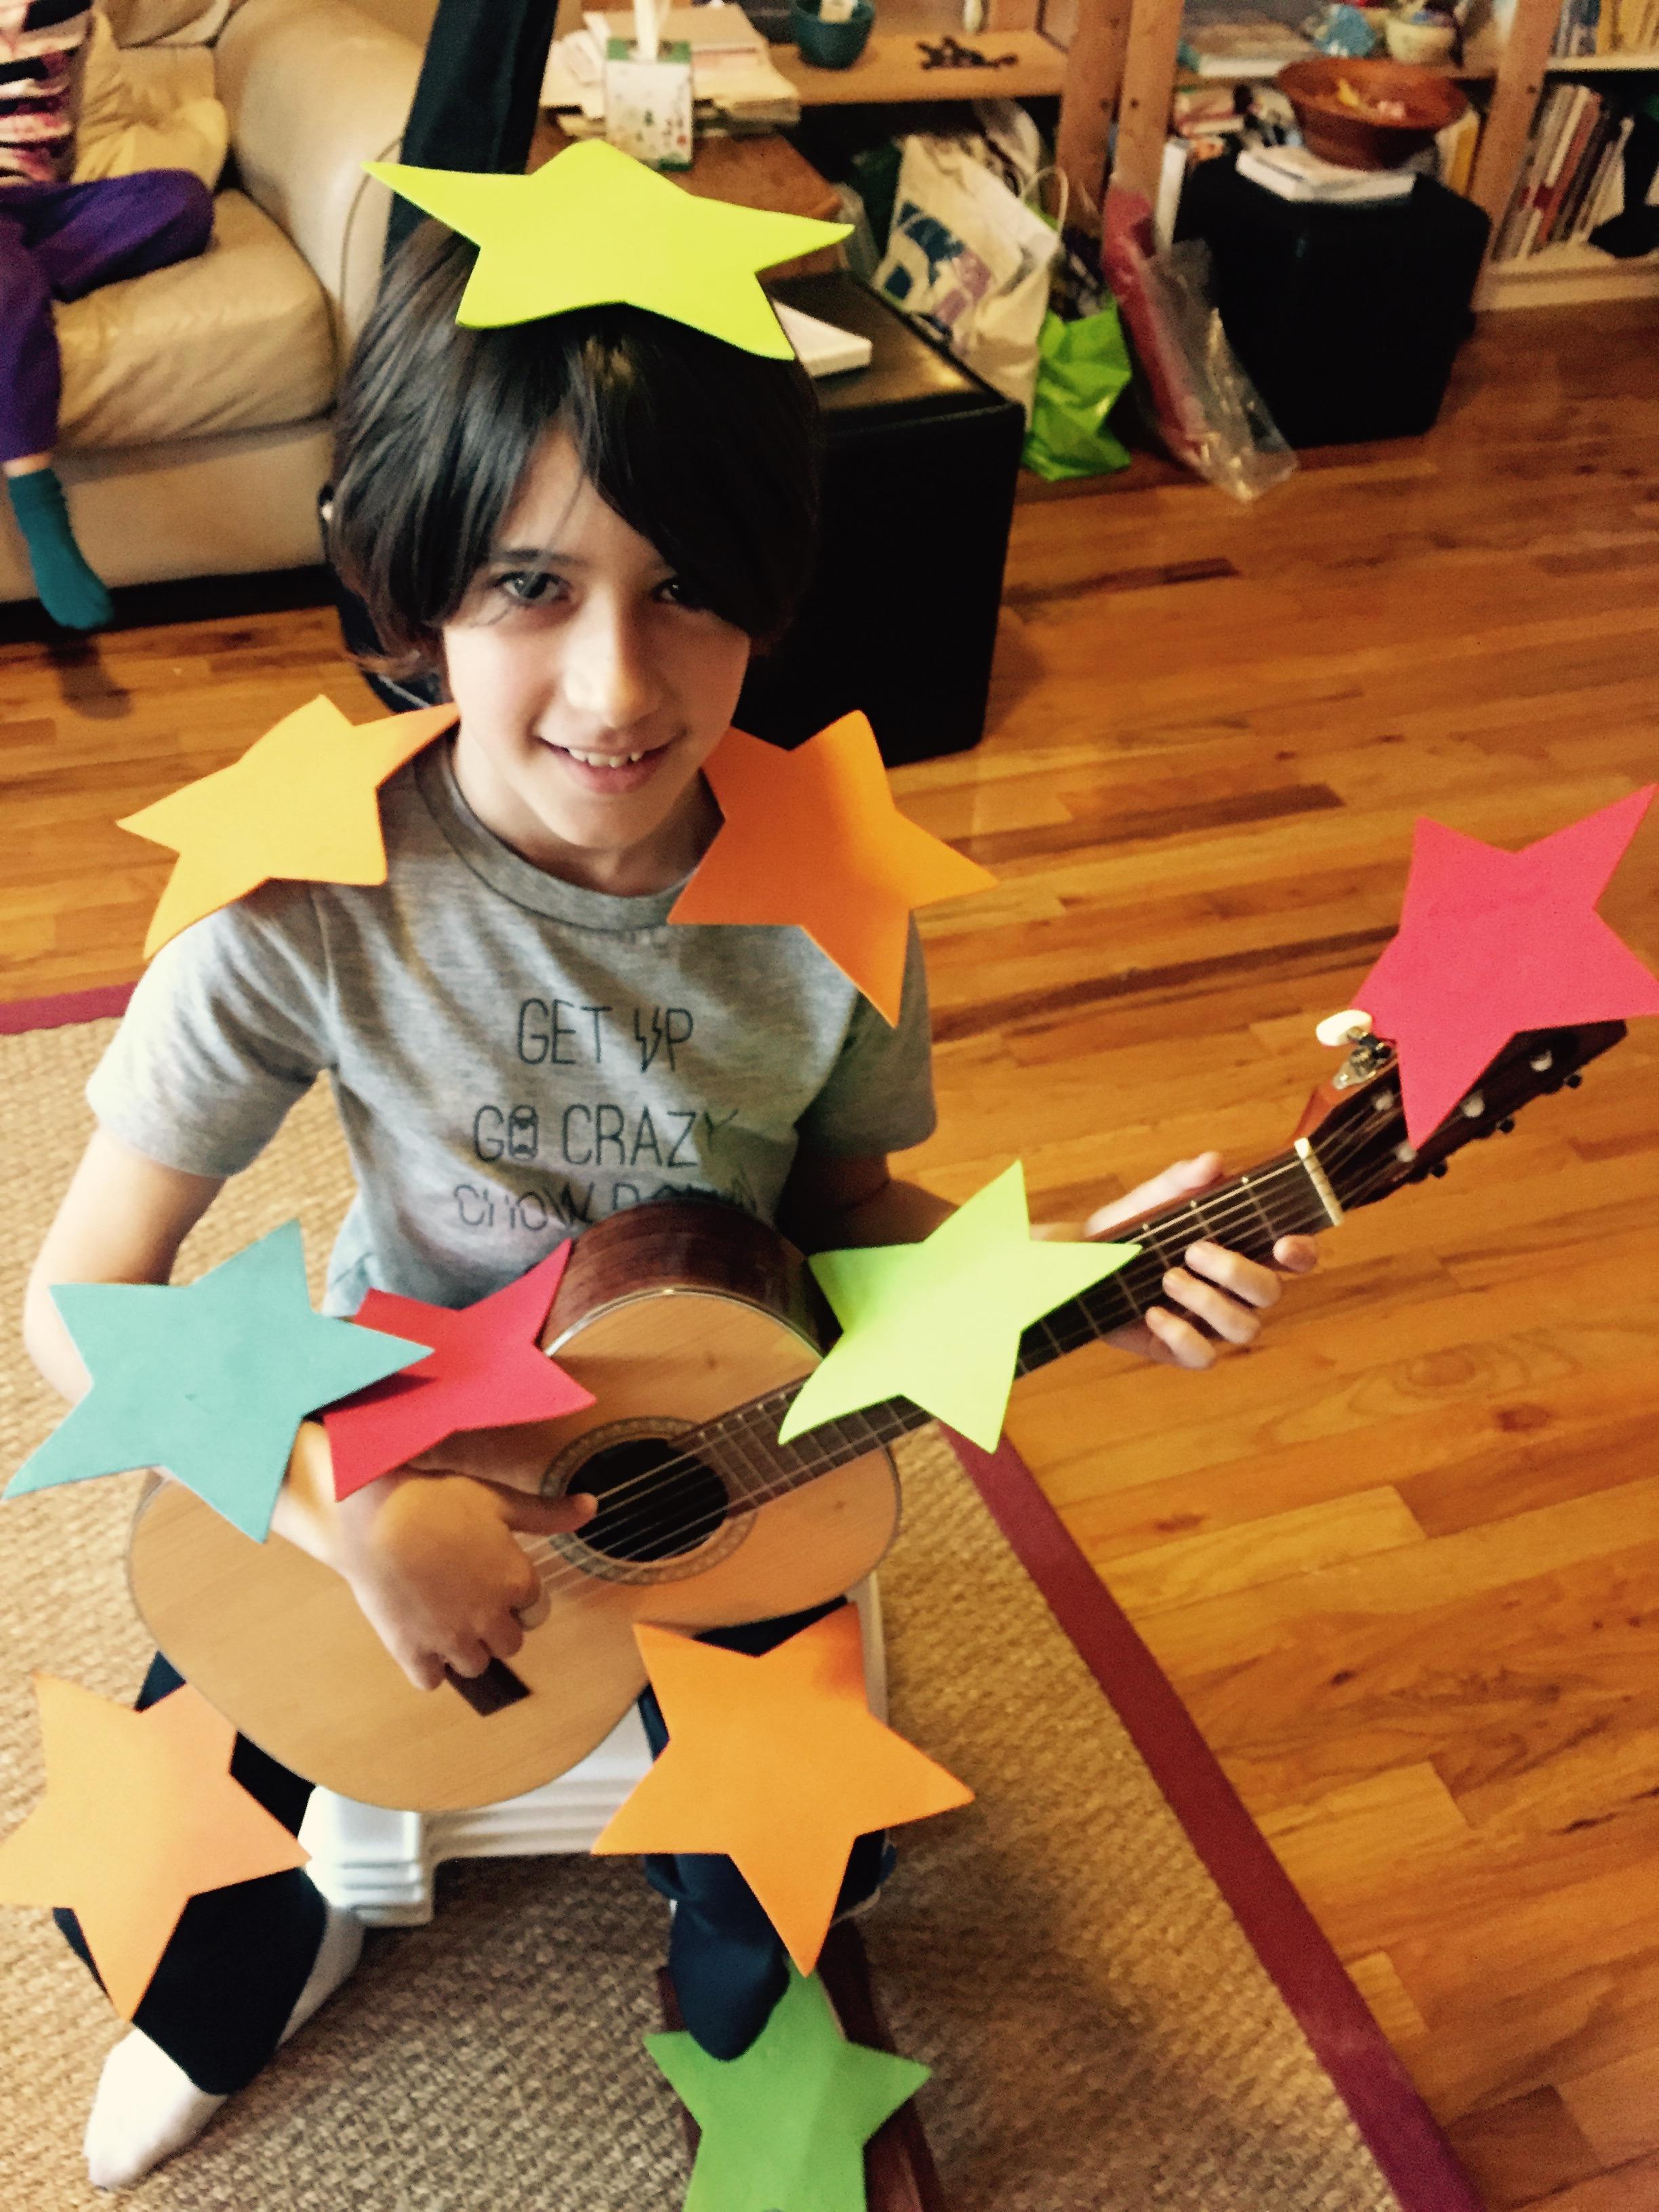 Good posture, guitar lessons nyc, Manhattan, Brooklyn, Queens, Harlem, Washington Heights, Guitar lessons near me